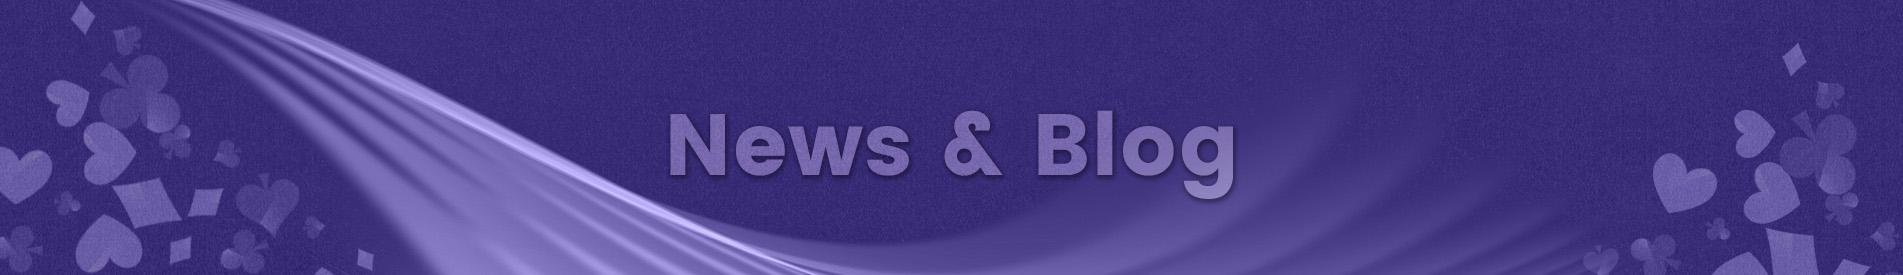 News and Blog fejlec grafika